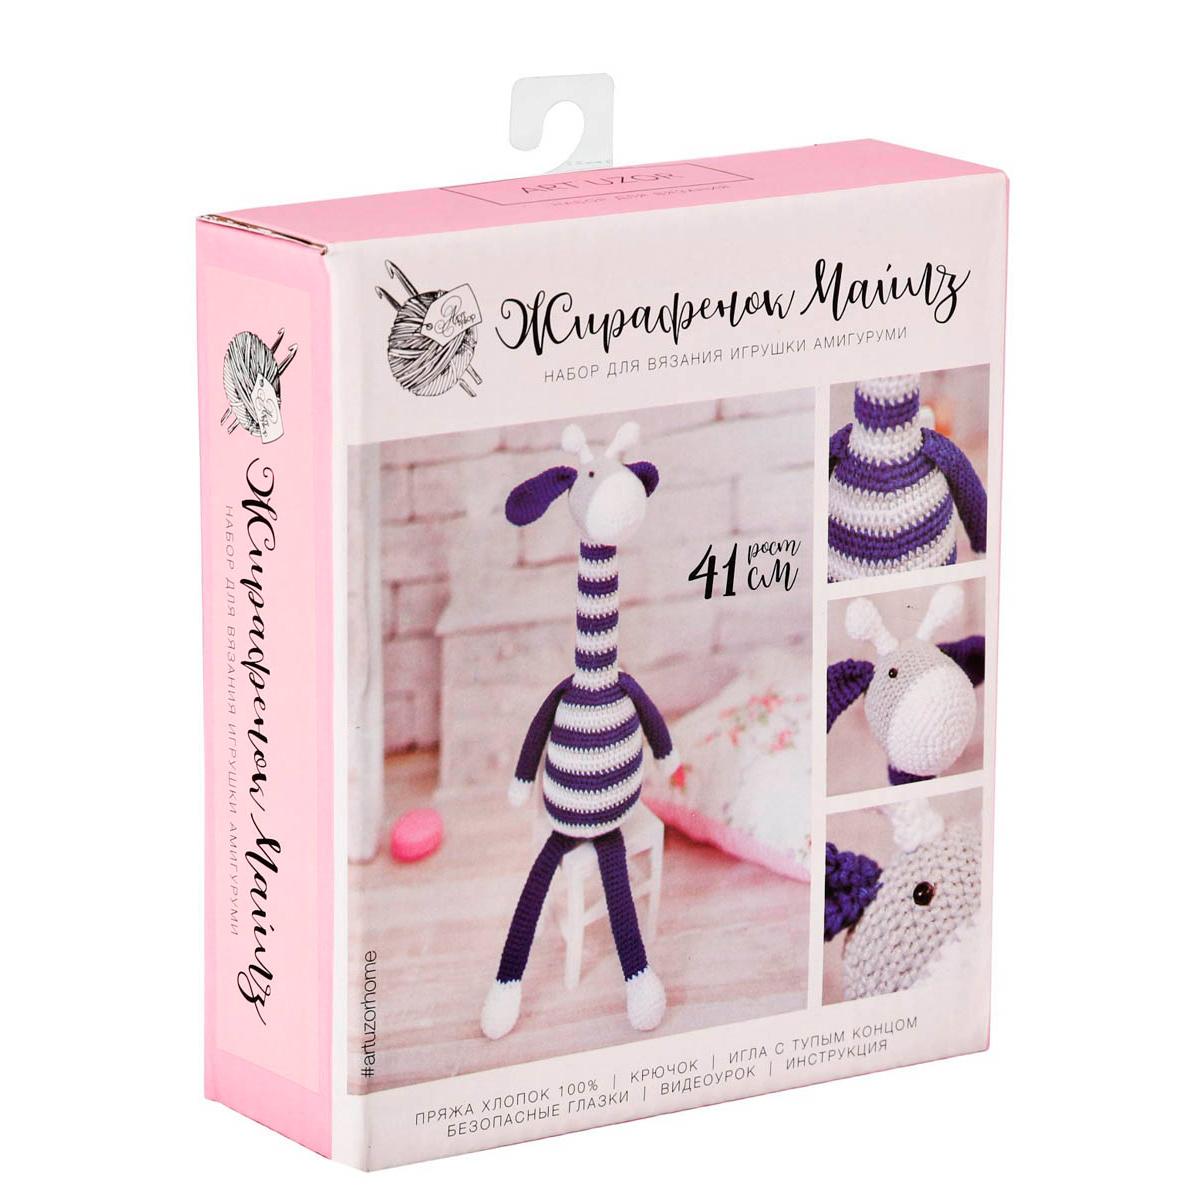 2724098 Амигуруми: Мягкая игрушка 'Жирафик Майлз', 41см набор для вязания